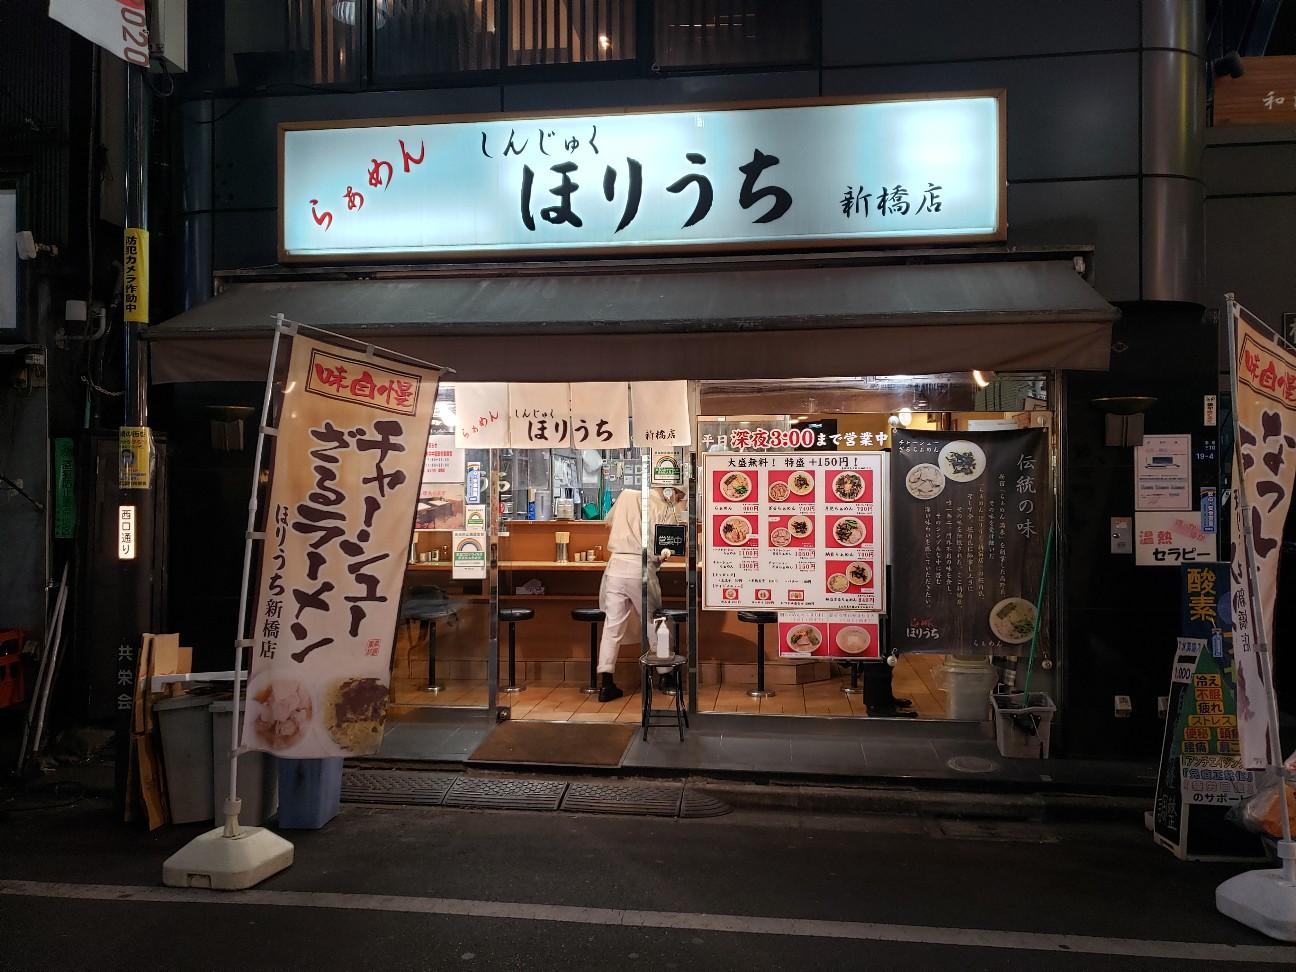 f:id:tt-suzukiit:20210121194236j:image